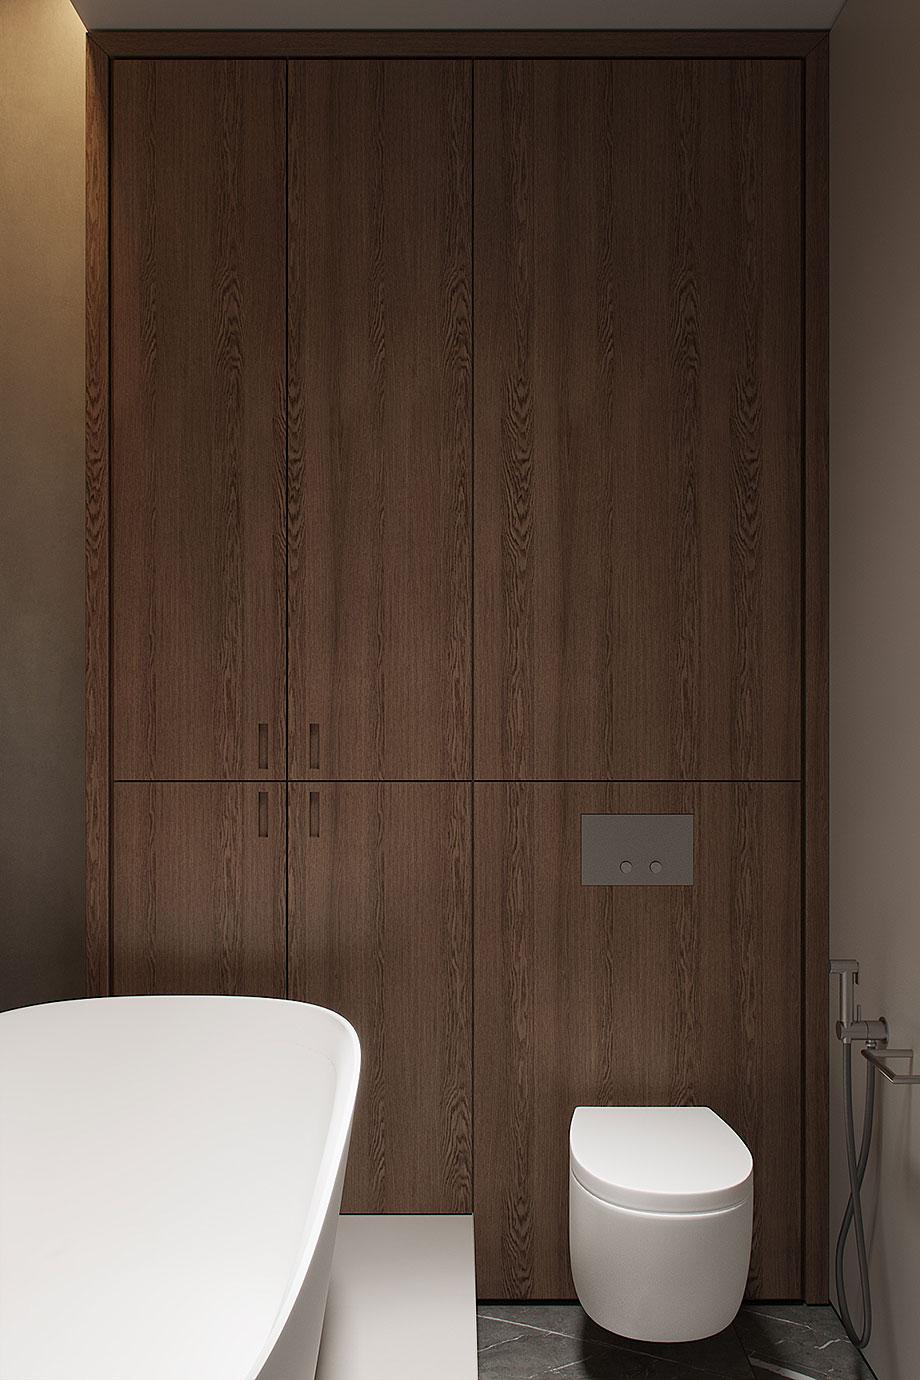 apartamento en moscu de kodd bureau (21) - foto daria koloskova